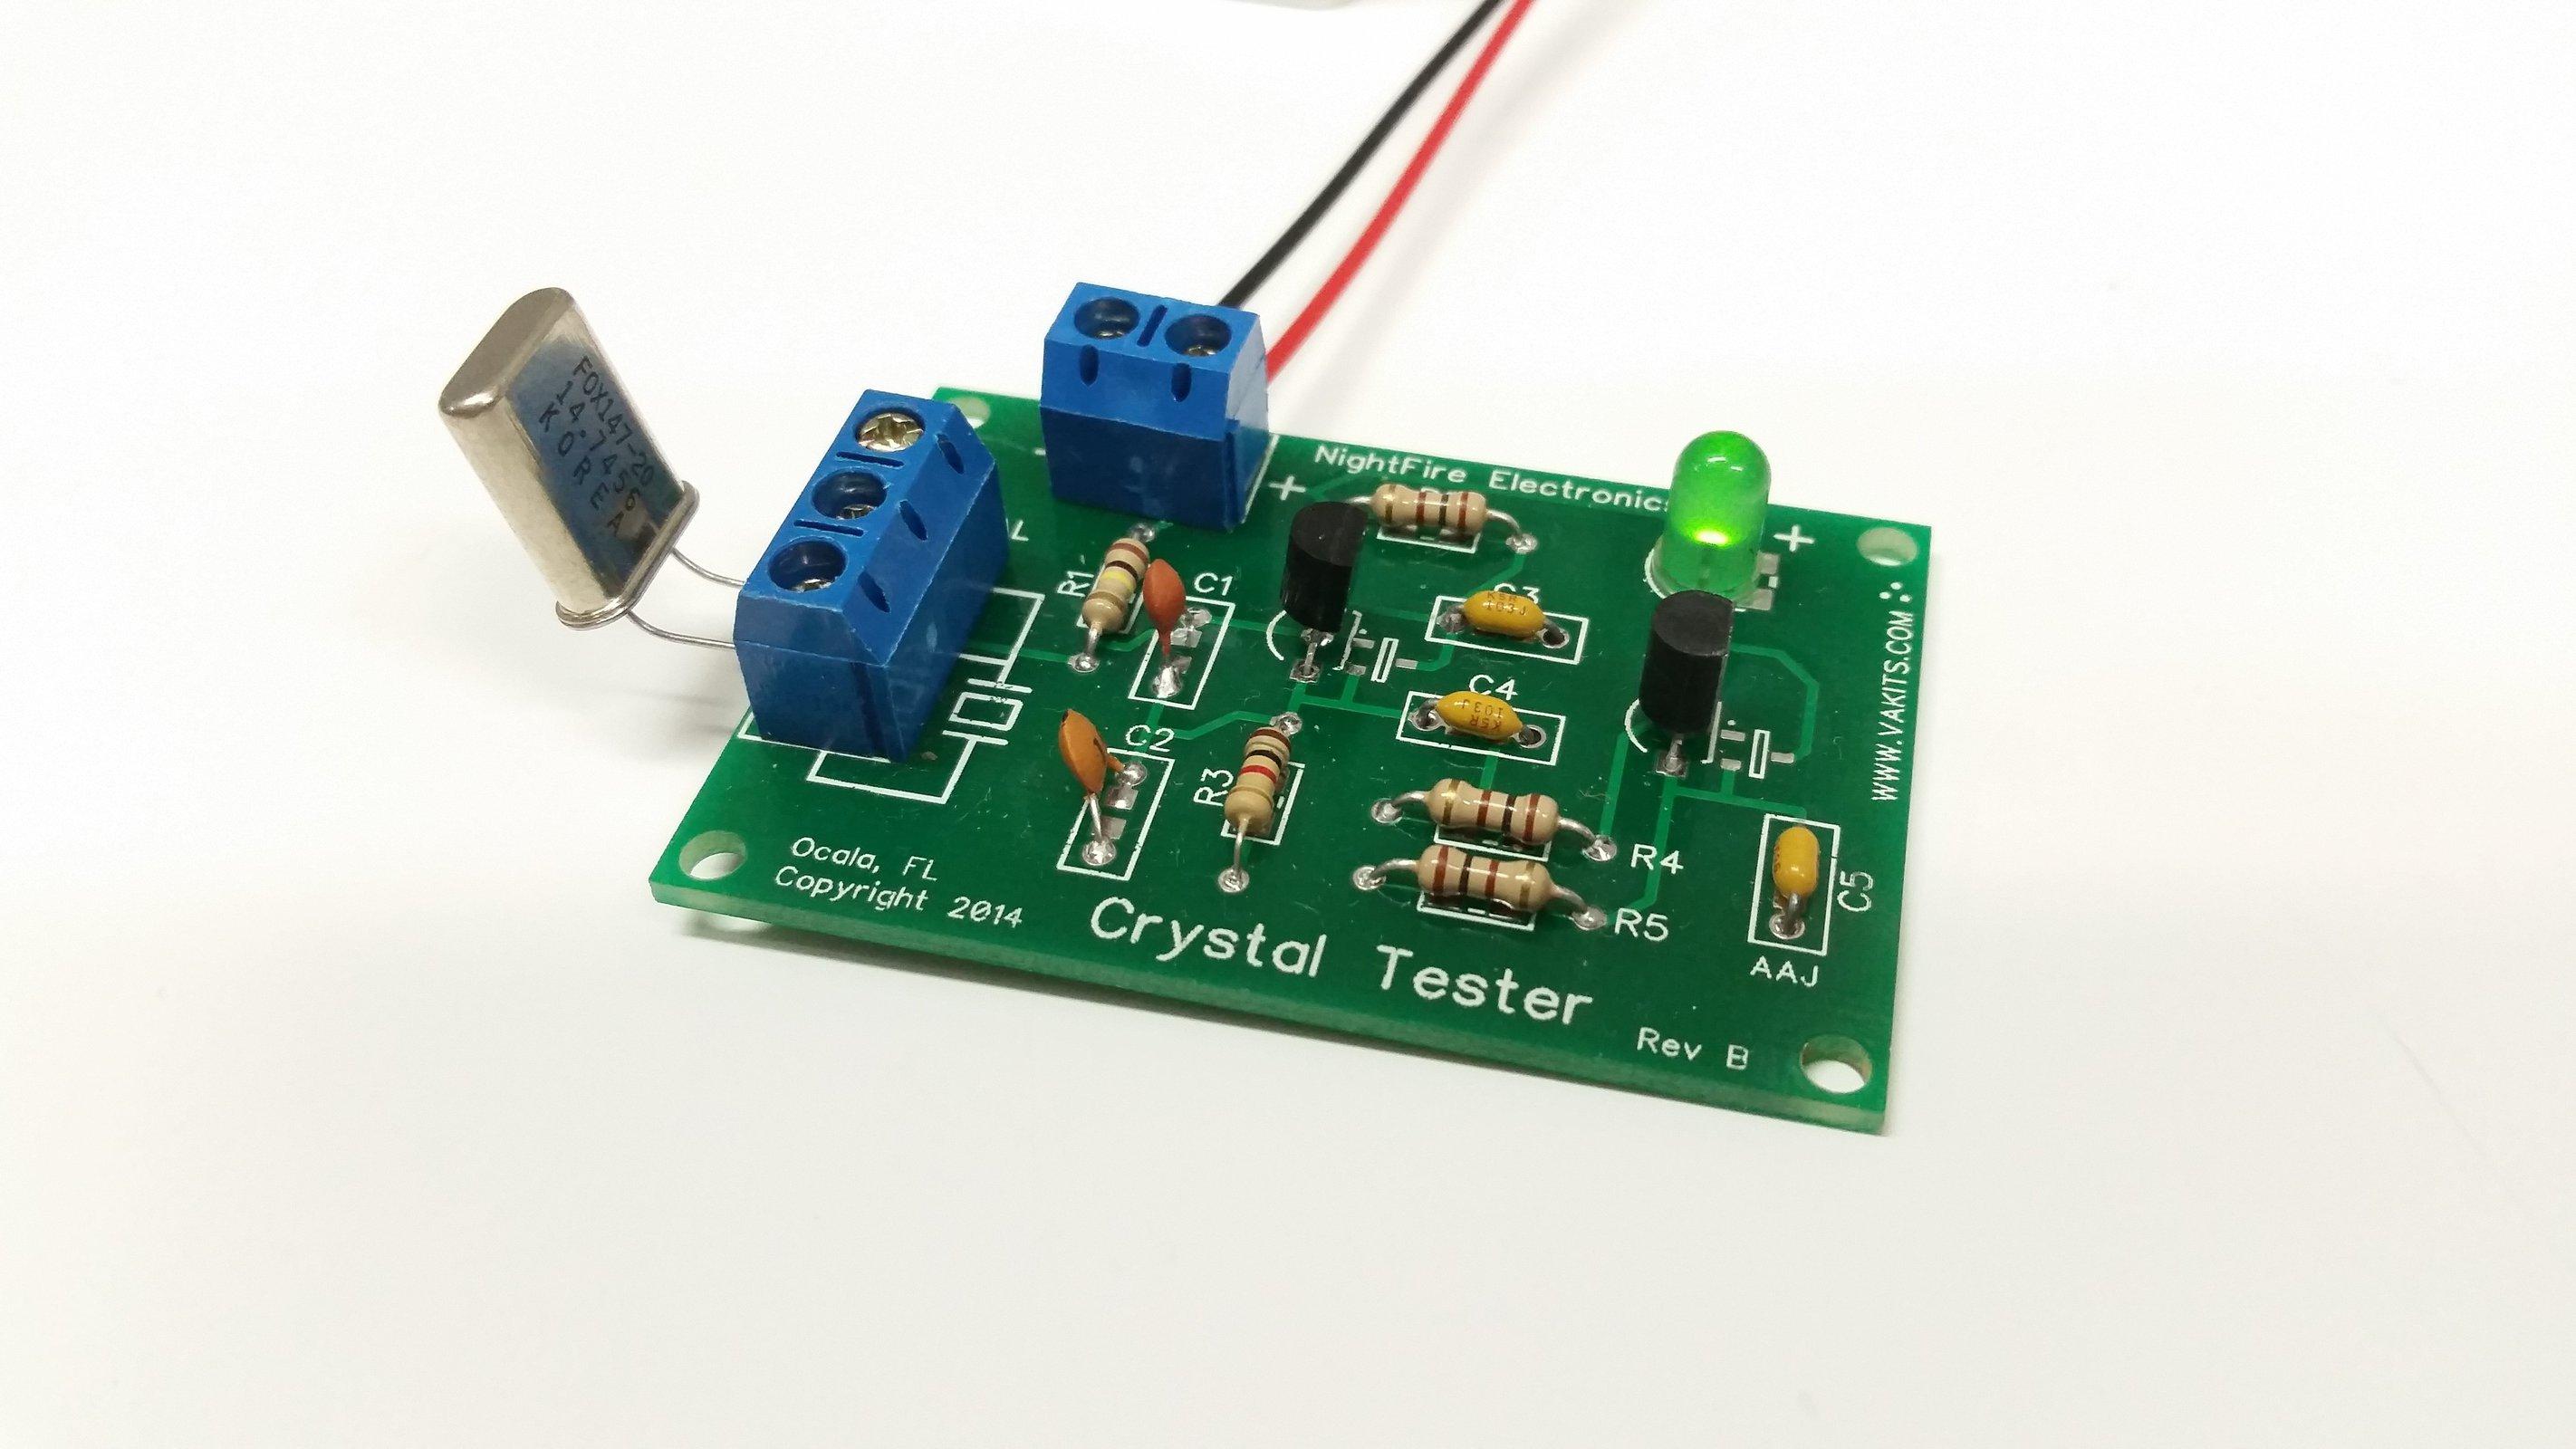 6 Led Scoreboard Kit Nightfire Electronics Circuit